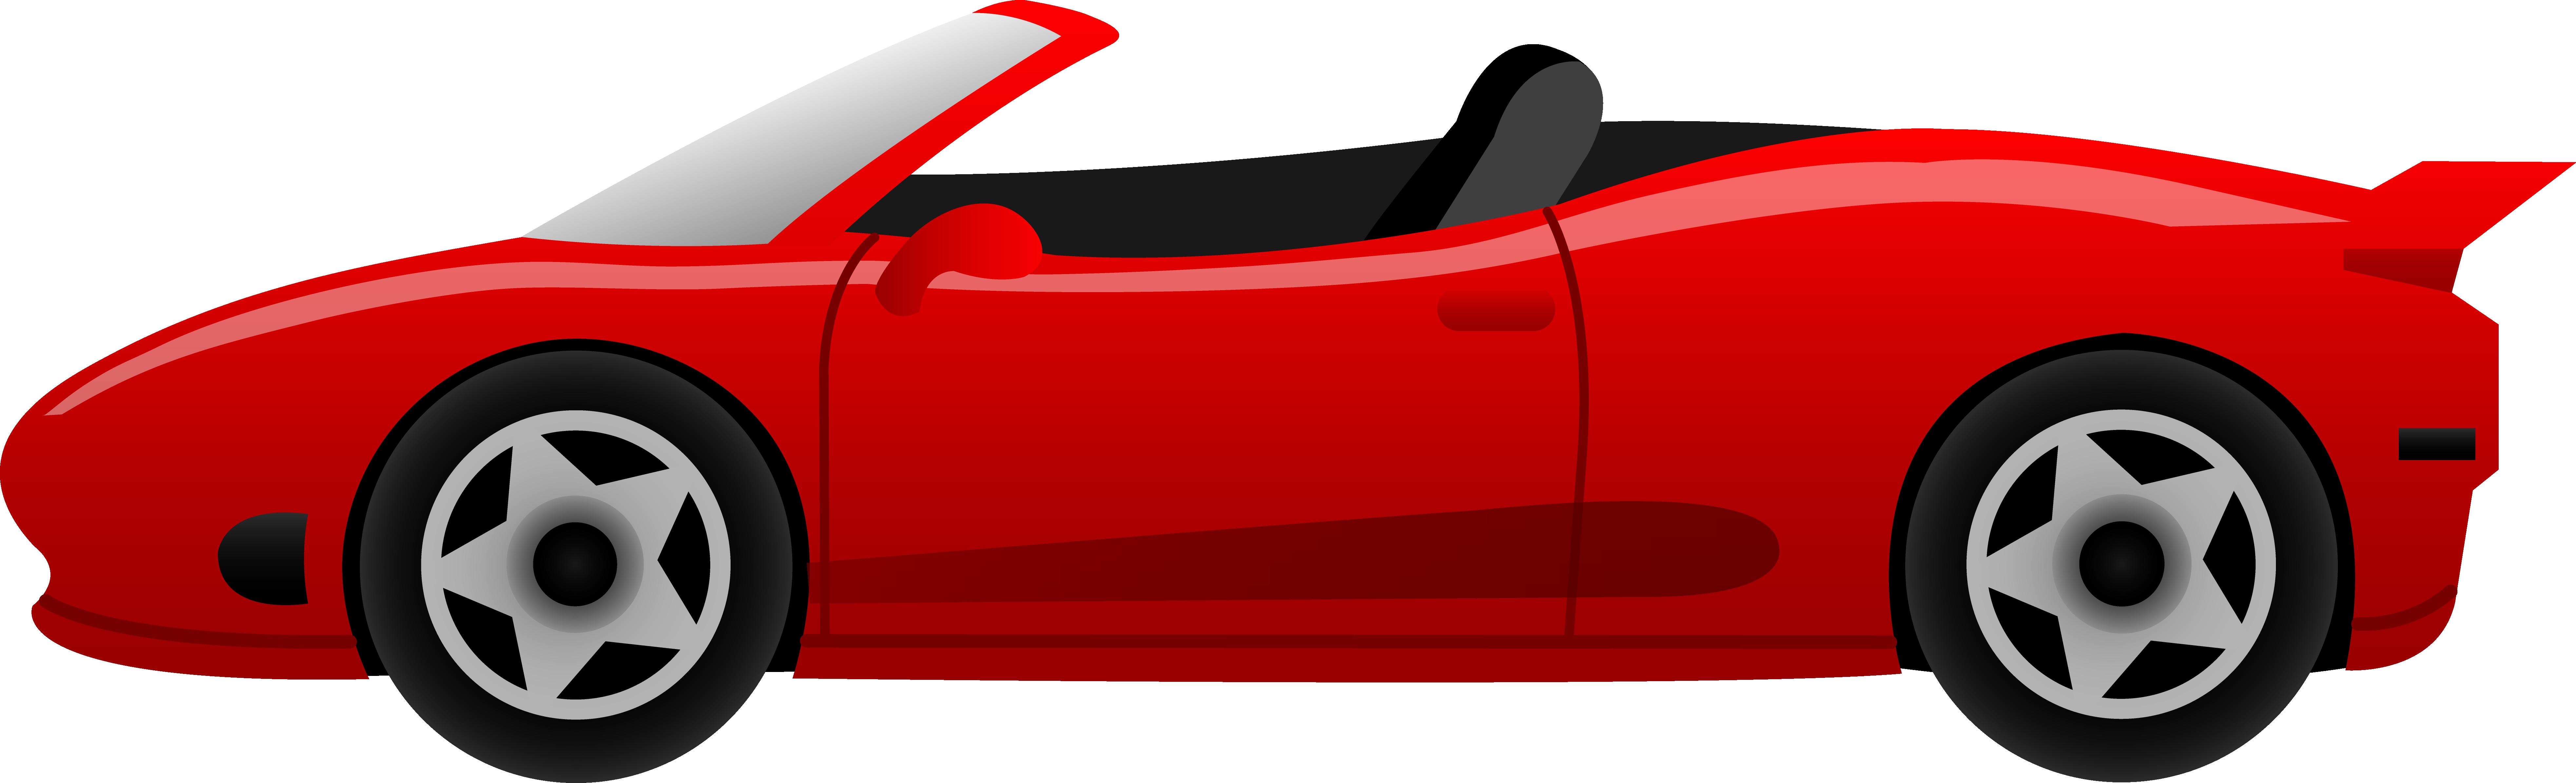 7863x2391 Lightning Mcqueen Cars Movie Wallpaper Fair Clipart